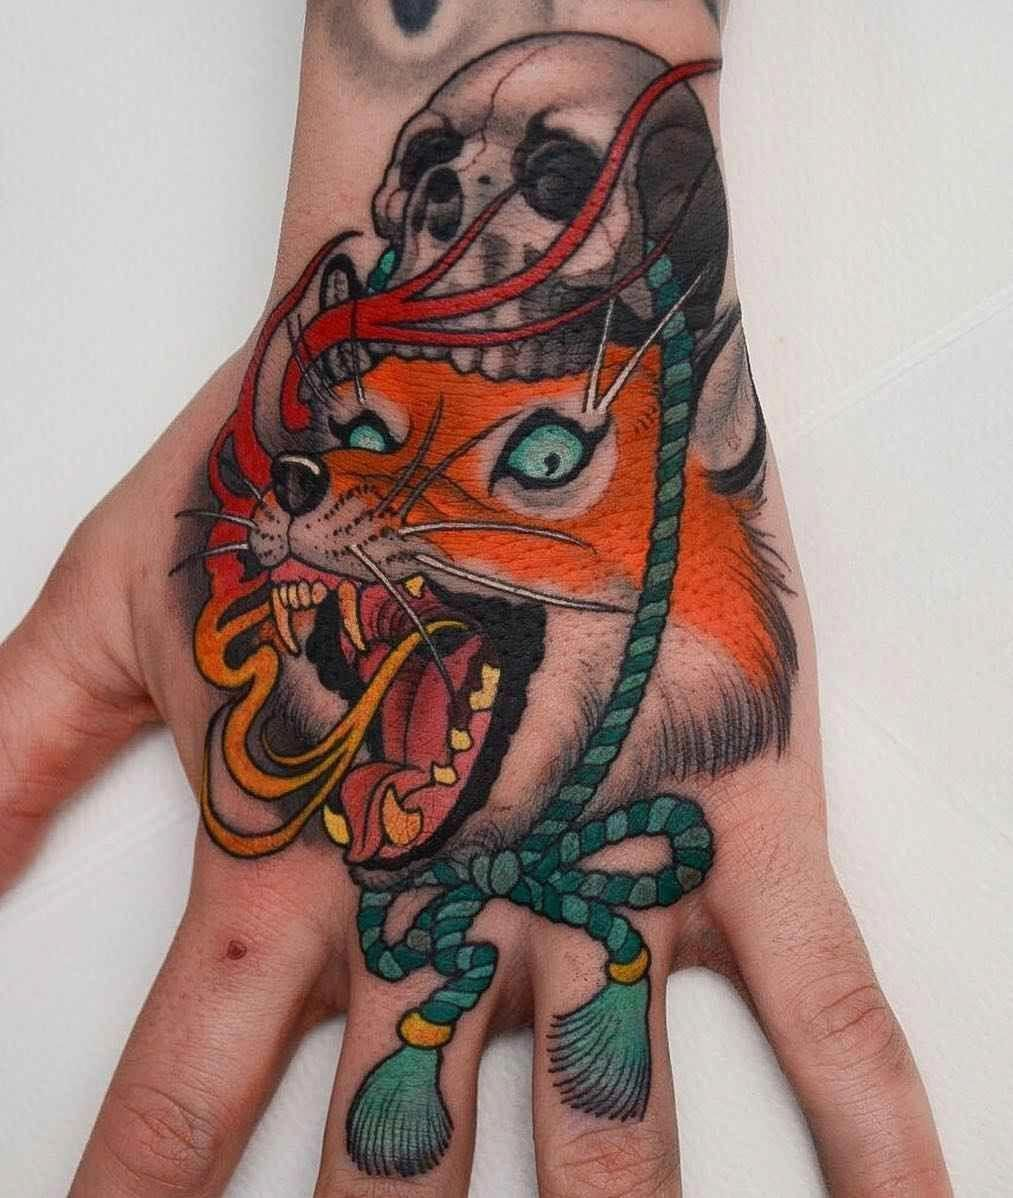 Tattoo artist Peter Lagergren, color aythors style tattoo